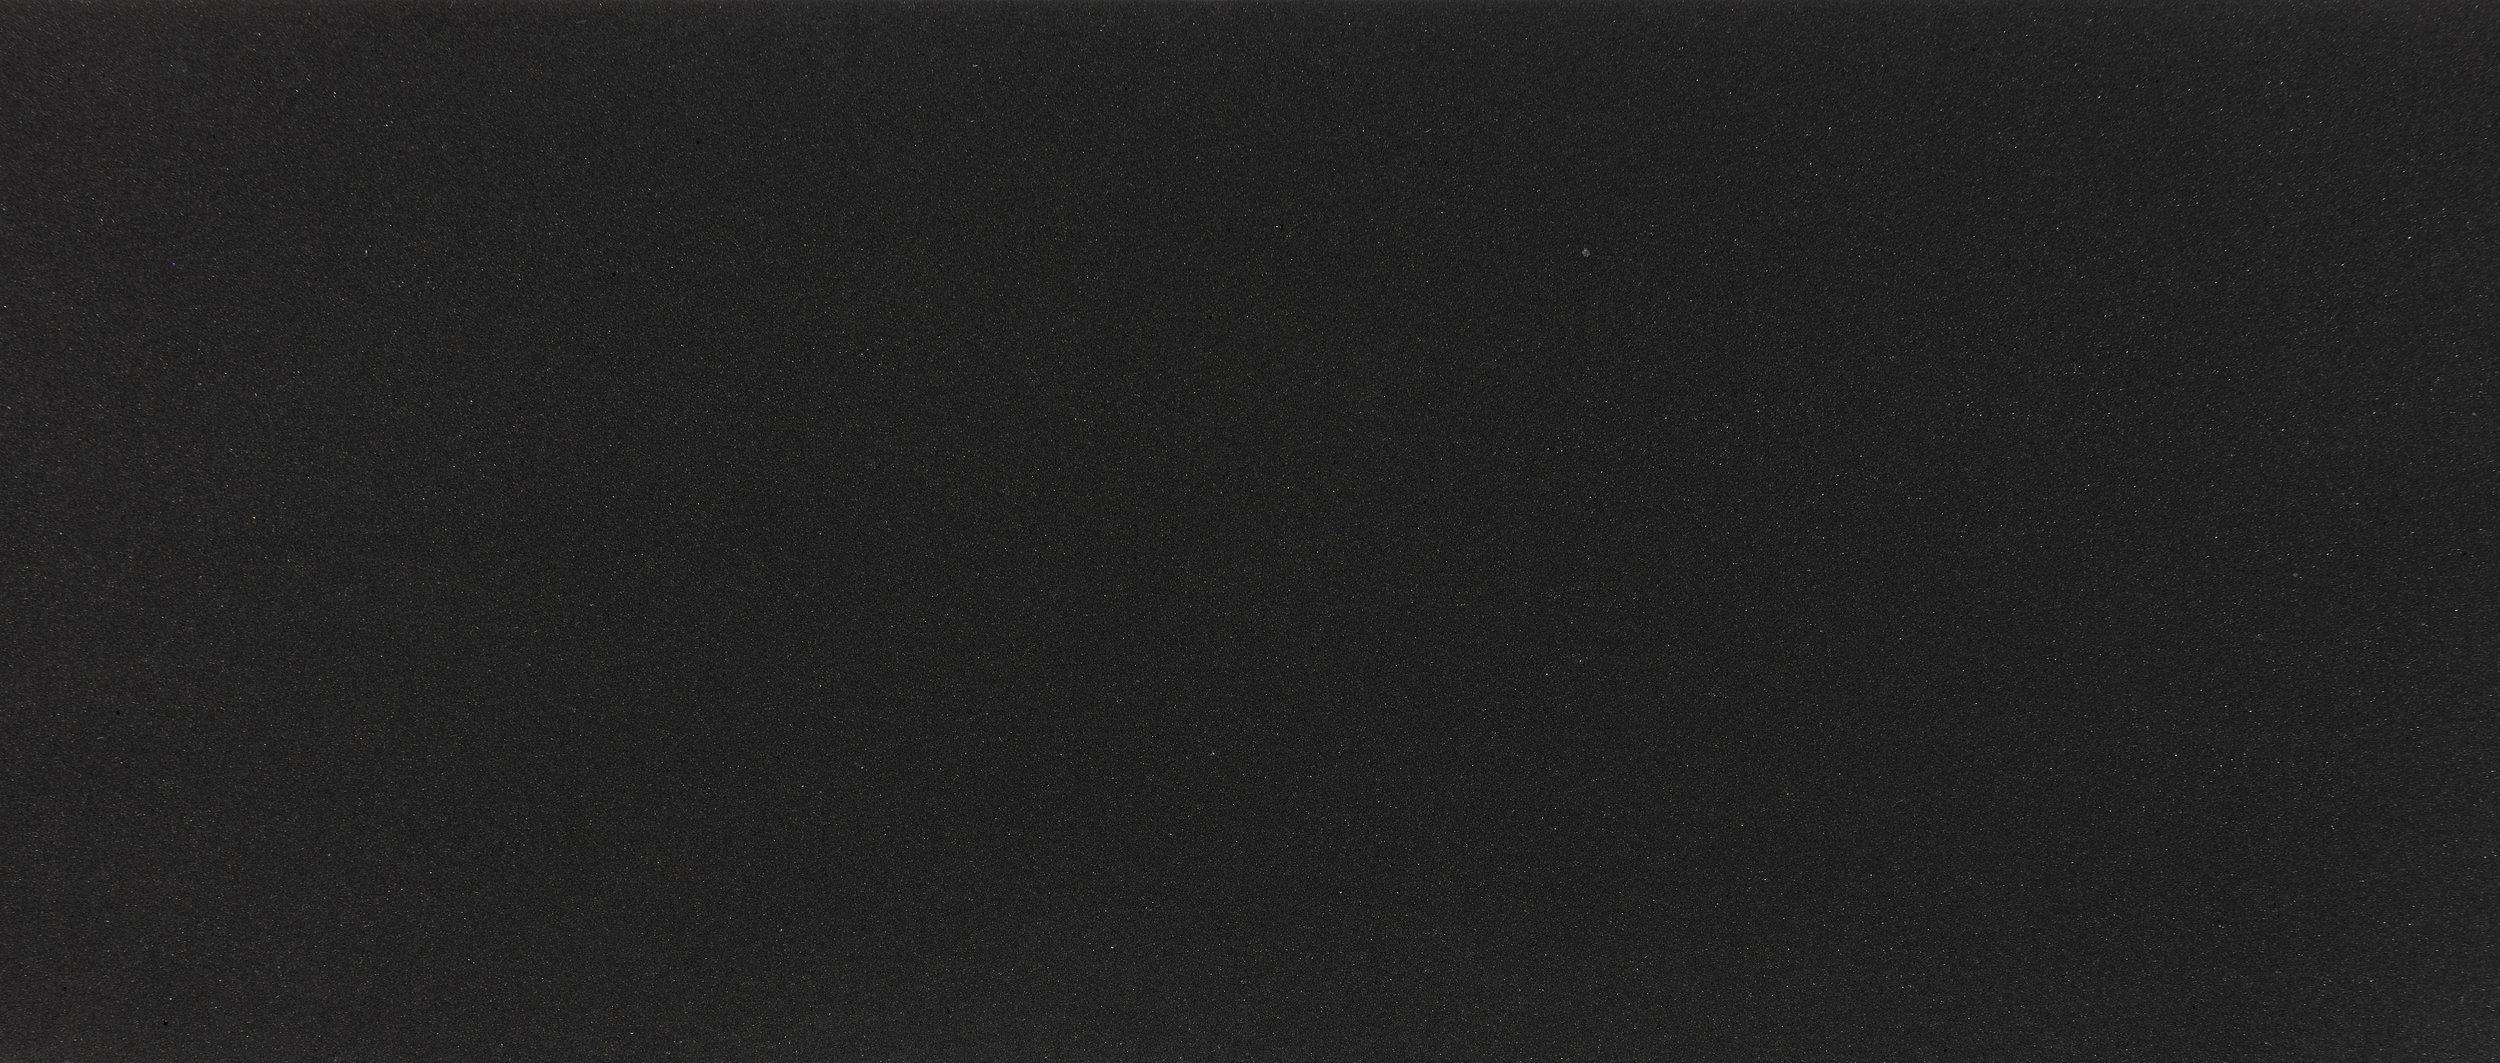 BE08_black.jpg